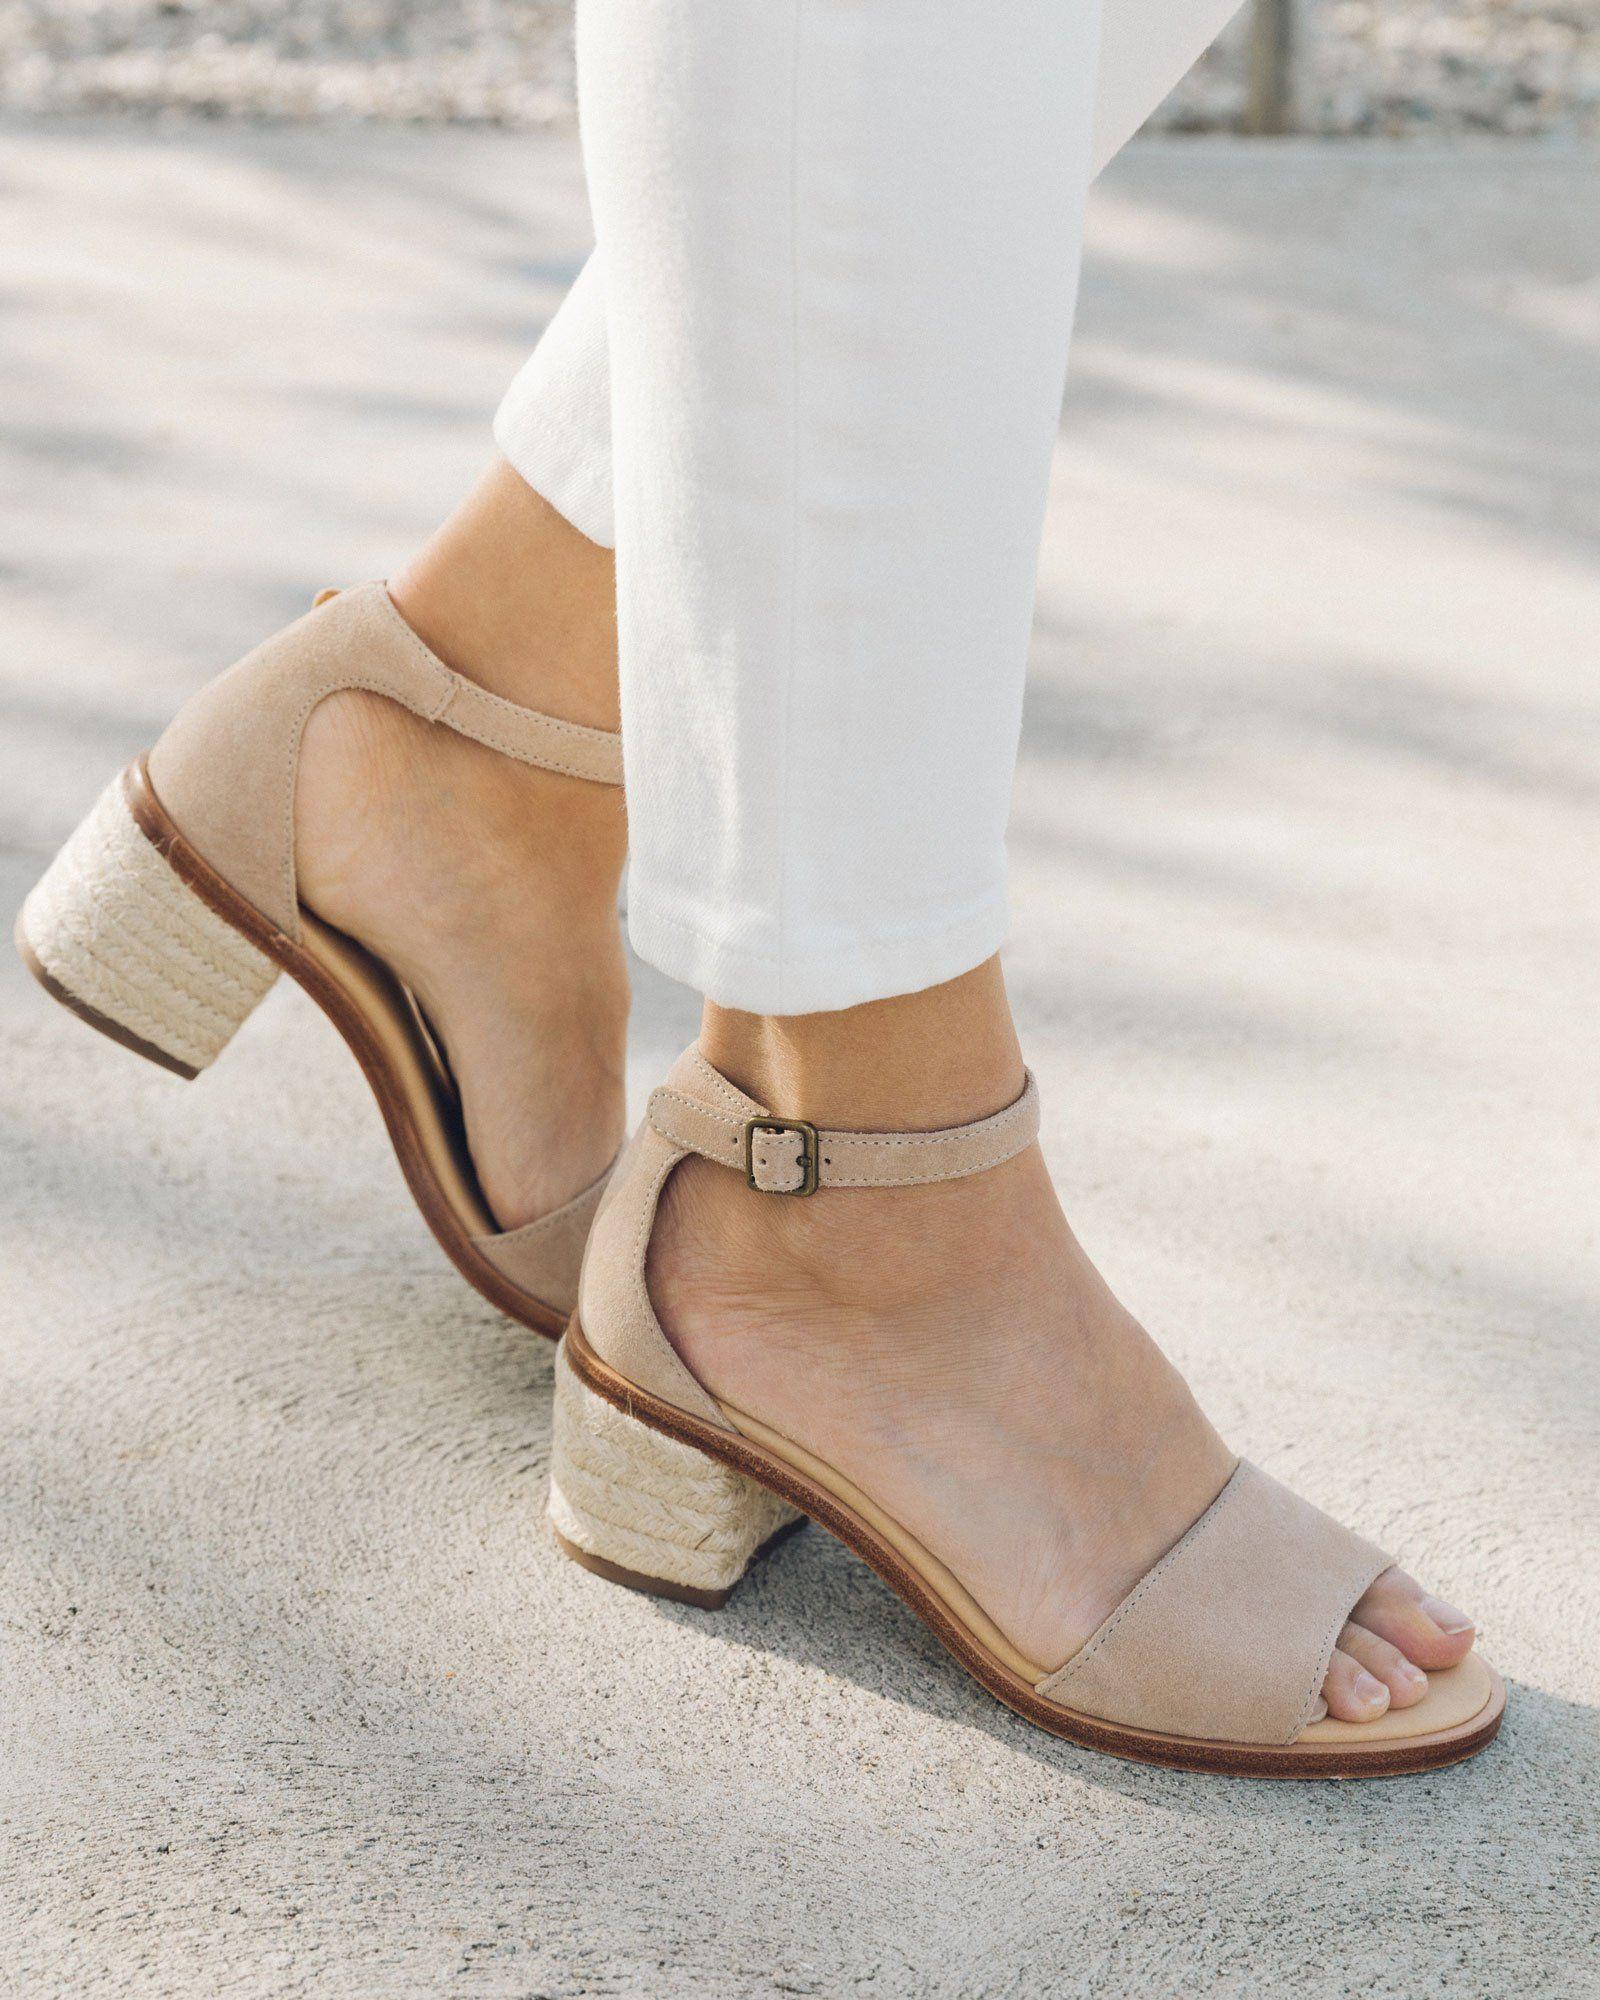 Pin By Lisa Okazaki On Footwear Cute Womens Shoes